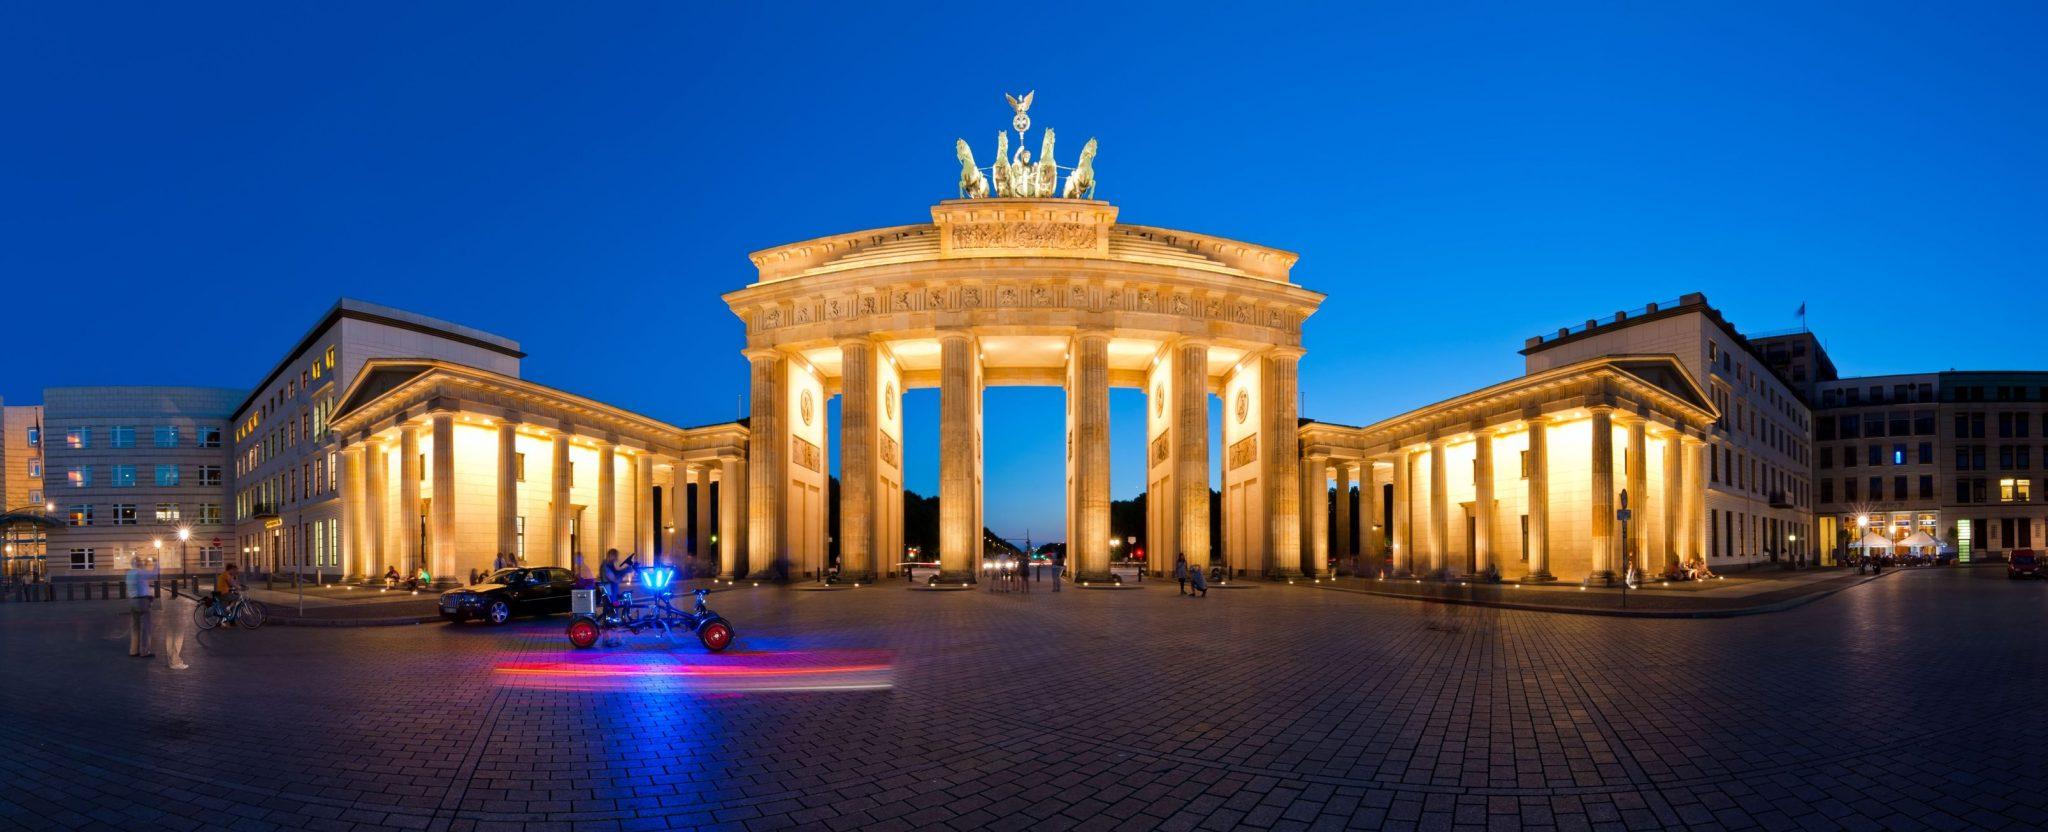 Un weekend a berlino affashionate com - Berlino porta di magdeburgo ...